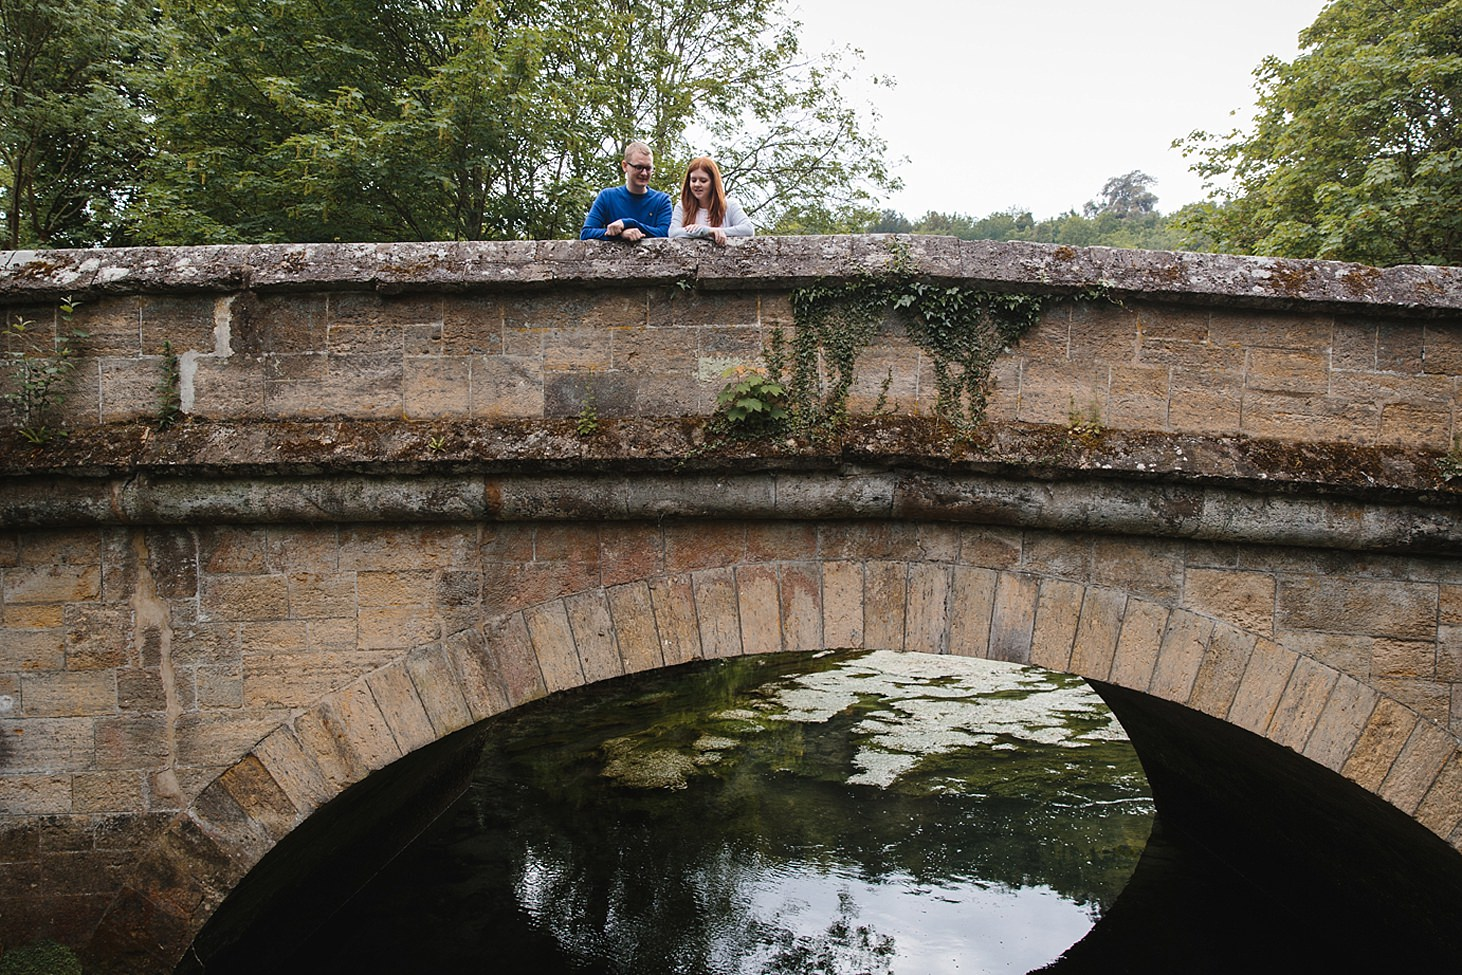 arundel engagement shoot couple on bridge over river